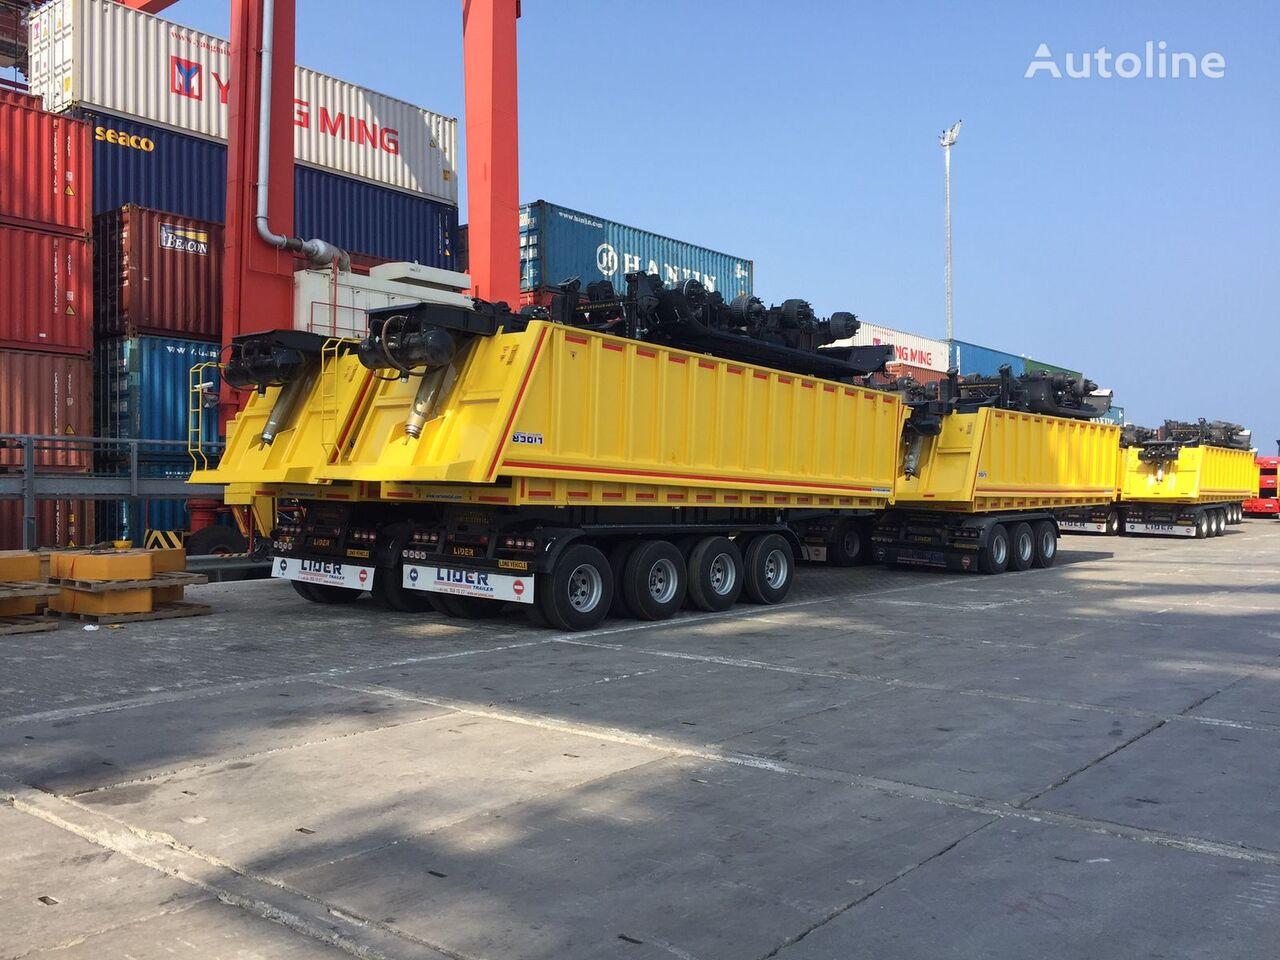 uus kallur poolhaagis LIDER 2019  new dumper from manufacturer company LIDER TRAILER